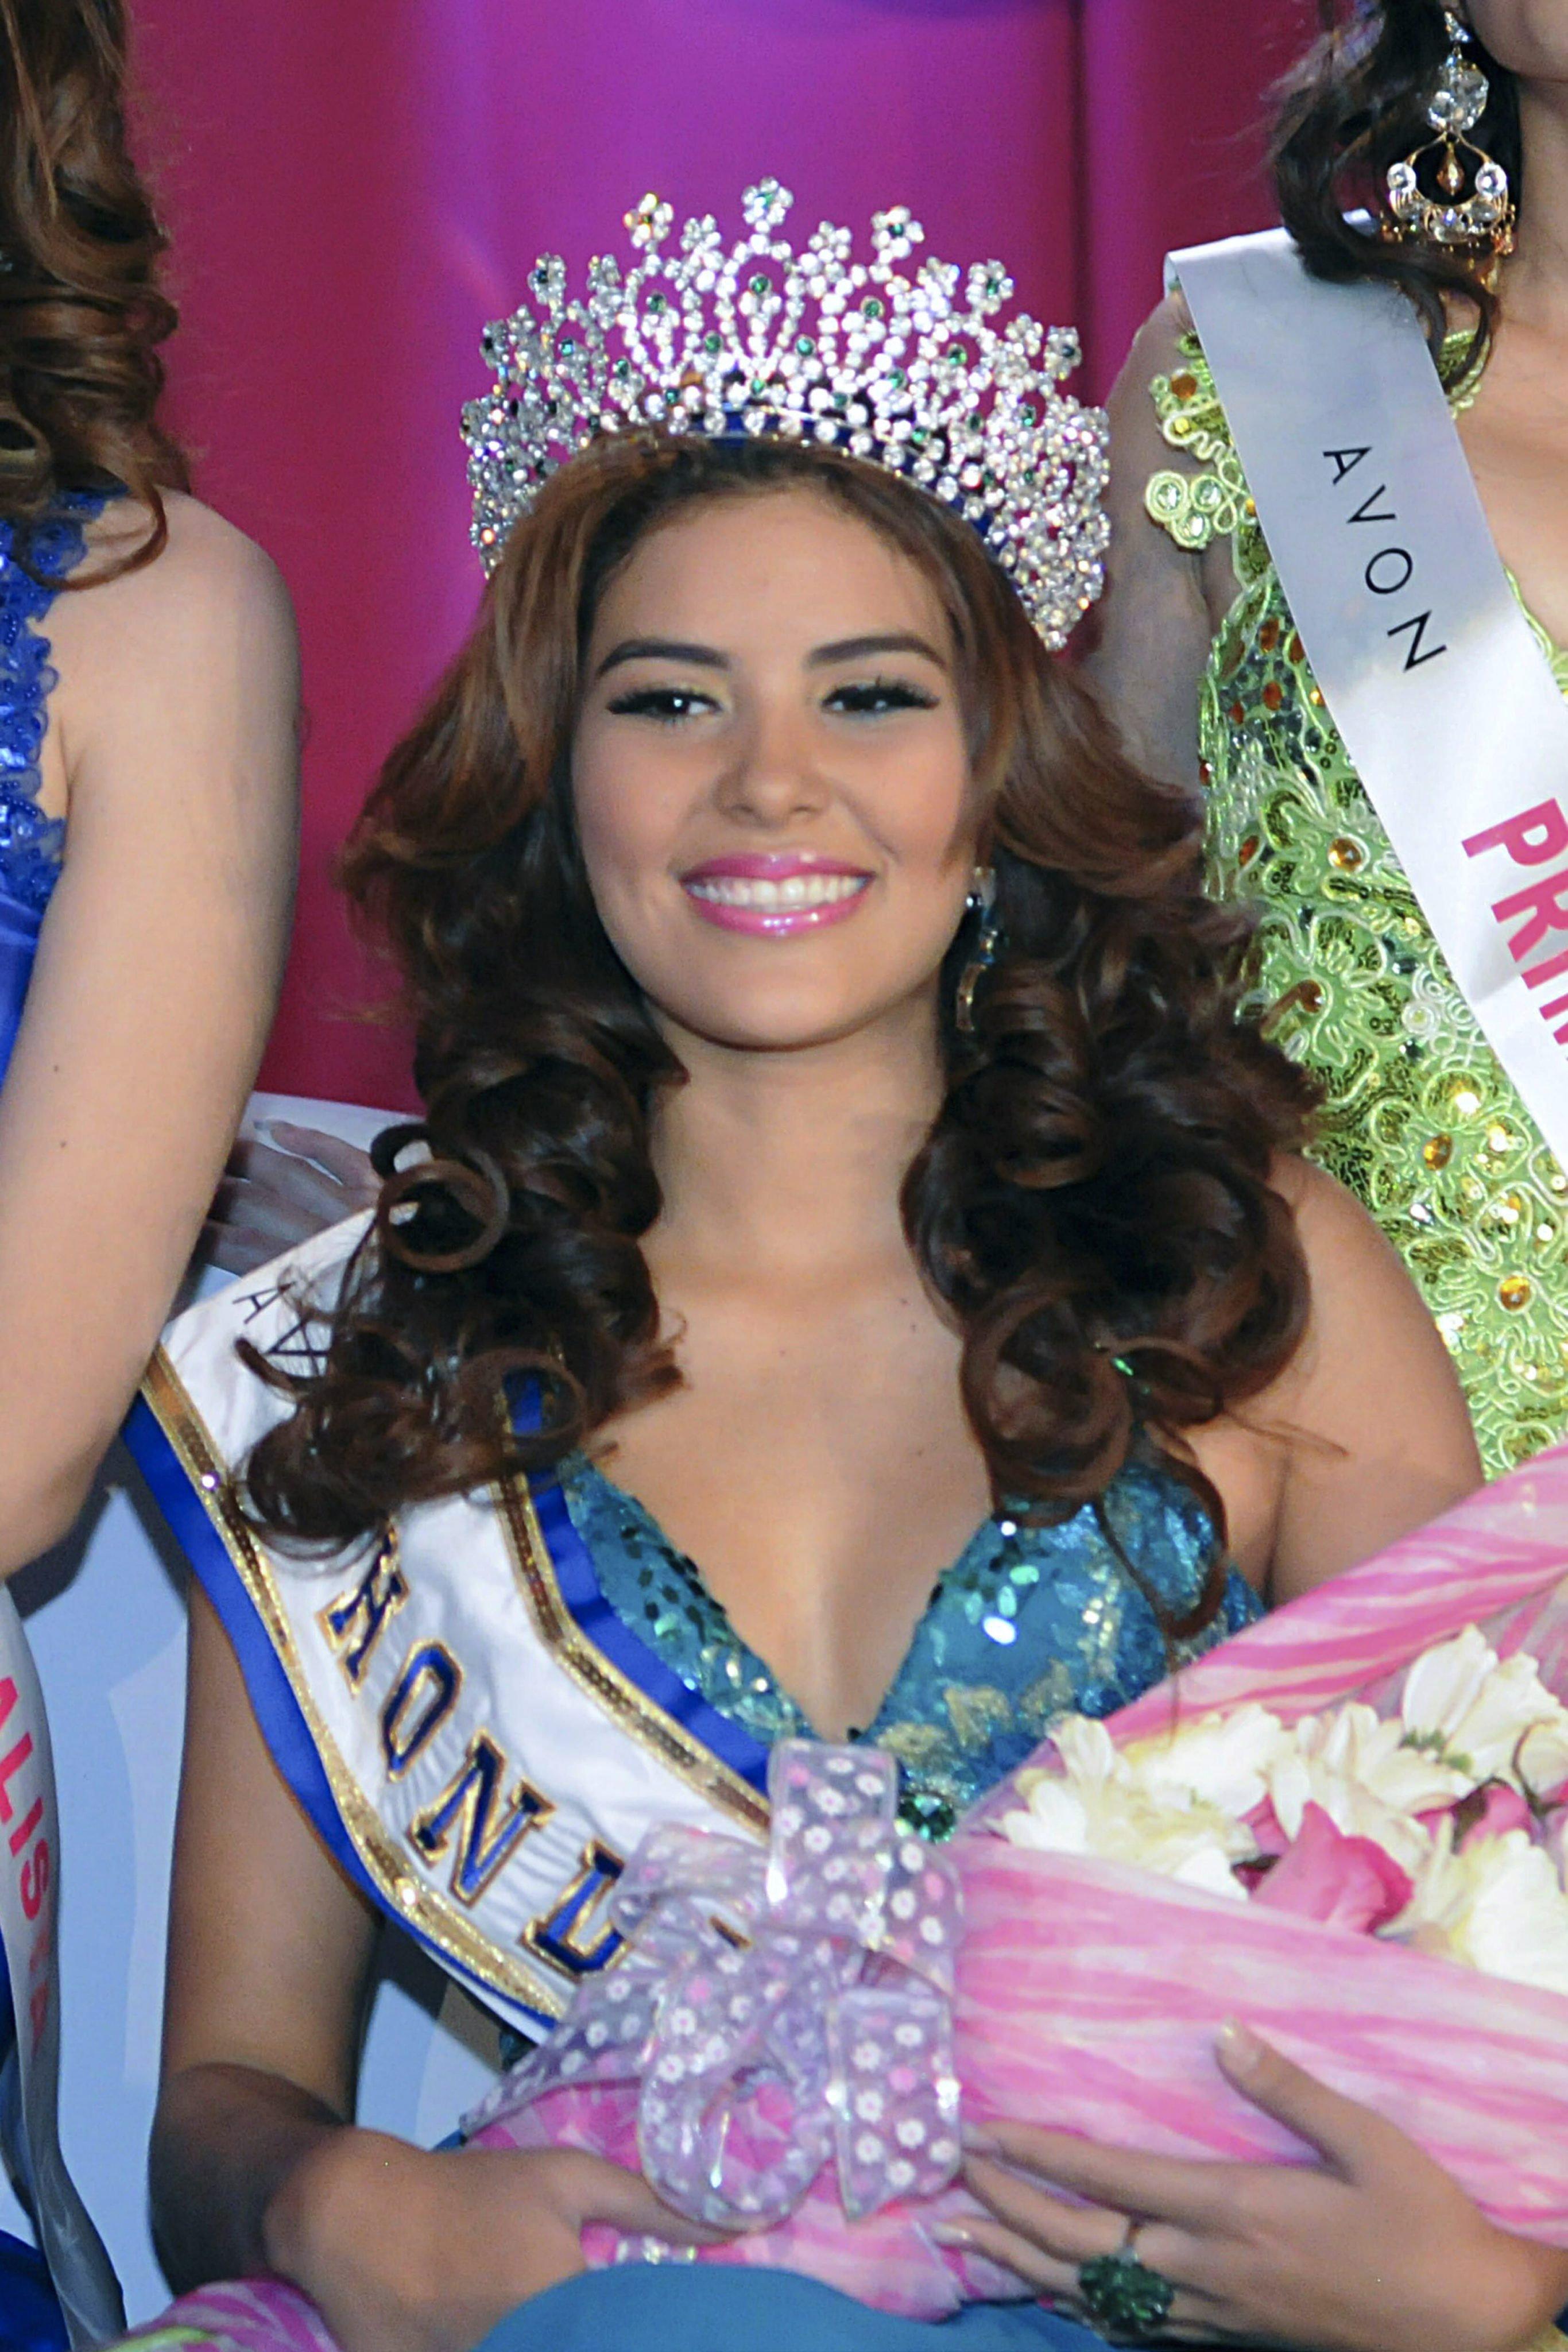 Miss World Honduras 2014 María José Alvarado in the ceremony of the event in San Pedro Sula, Honduras, on April 26, 2014